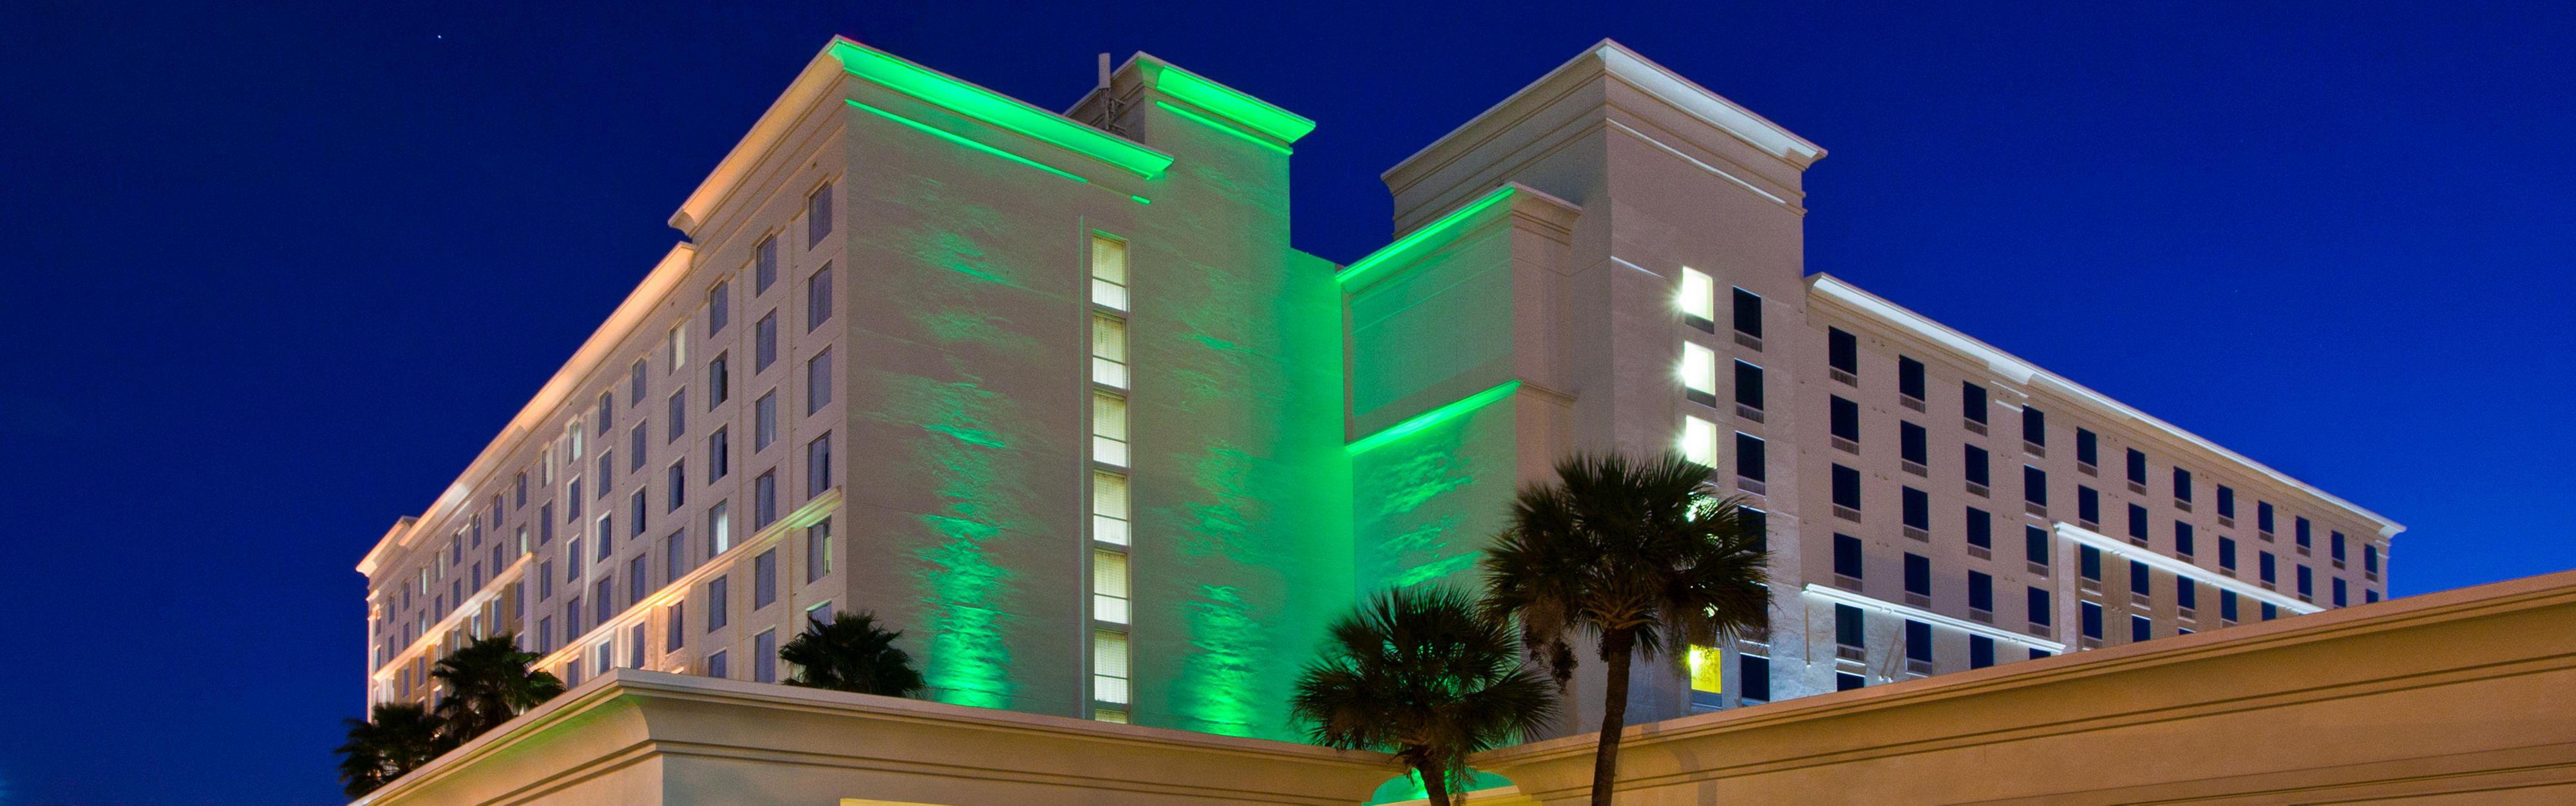 Crowne Plaza Orlando - Universal Blvd Hotel - TripAdvisor